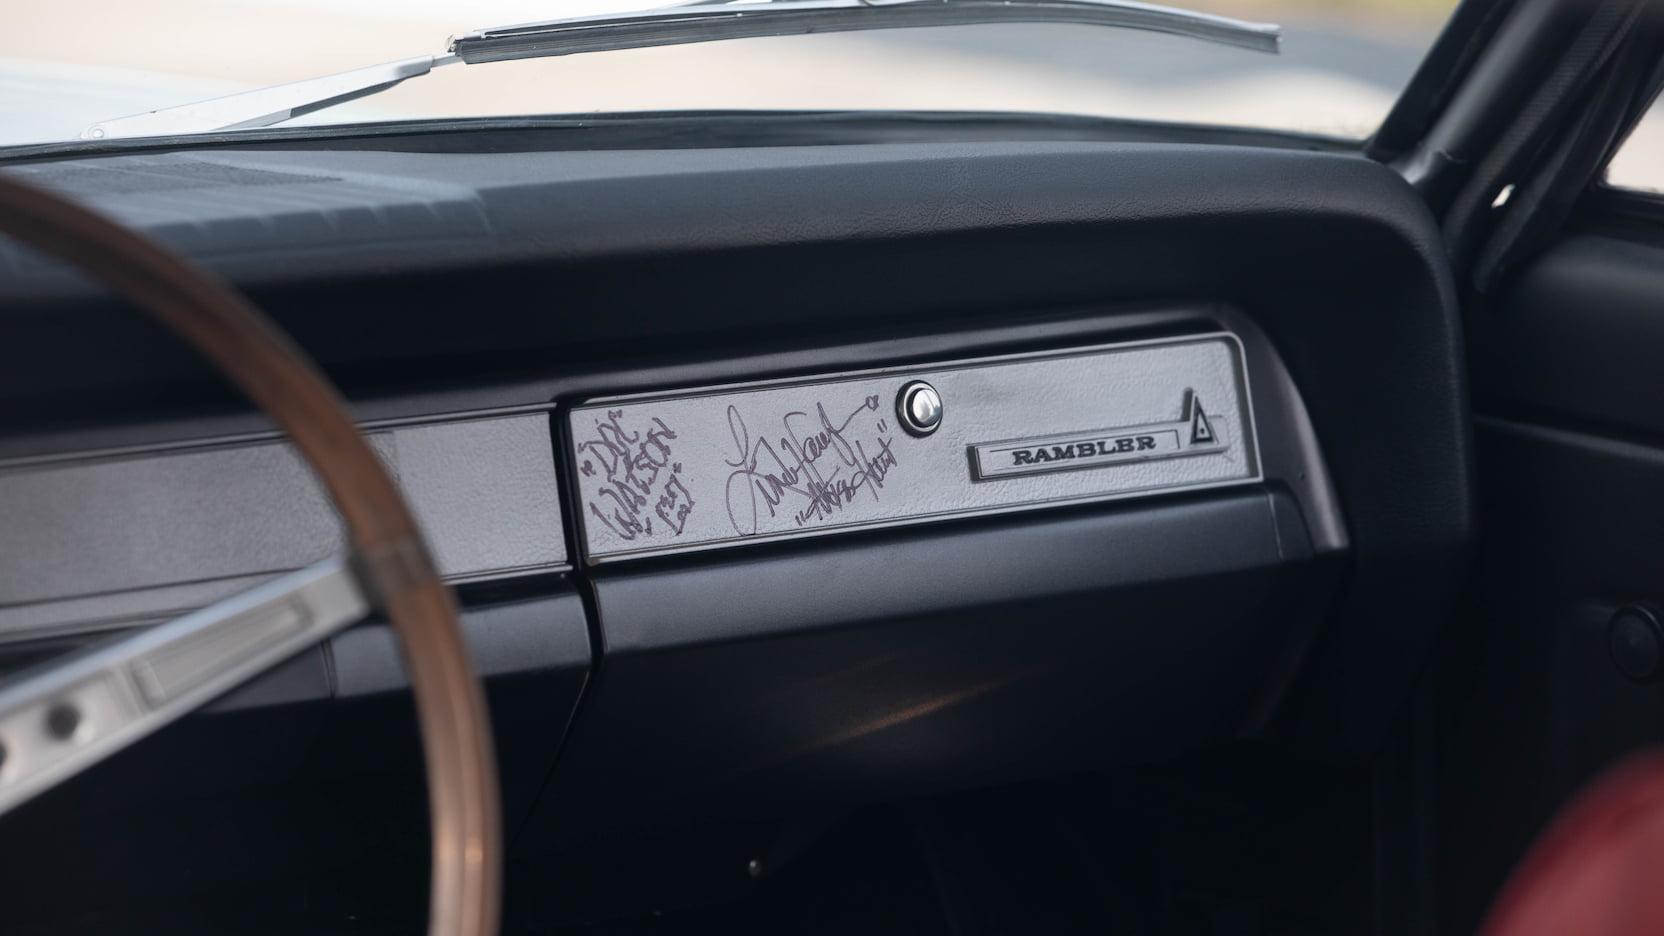 1969 AMC Hurst SC/Rambler glove box